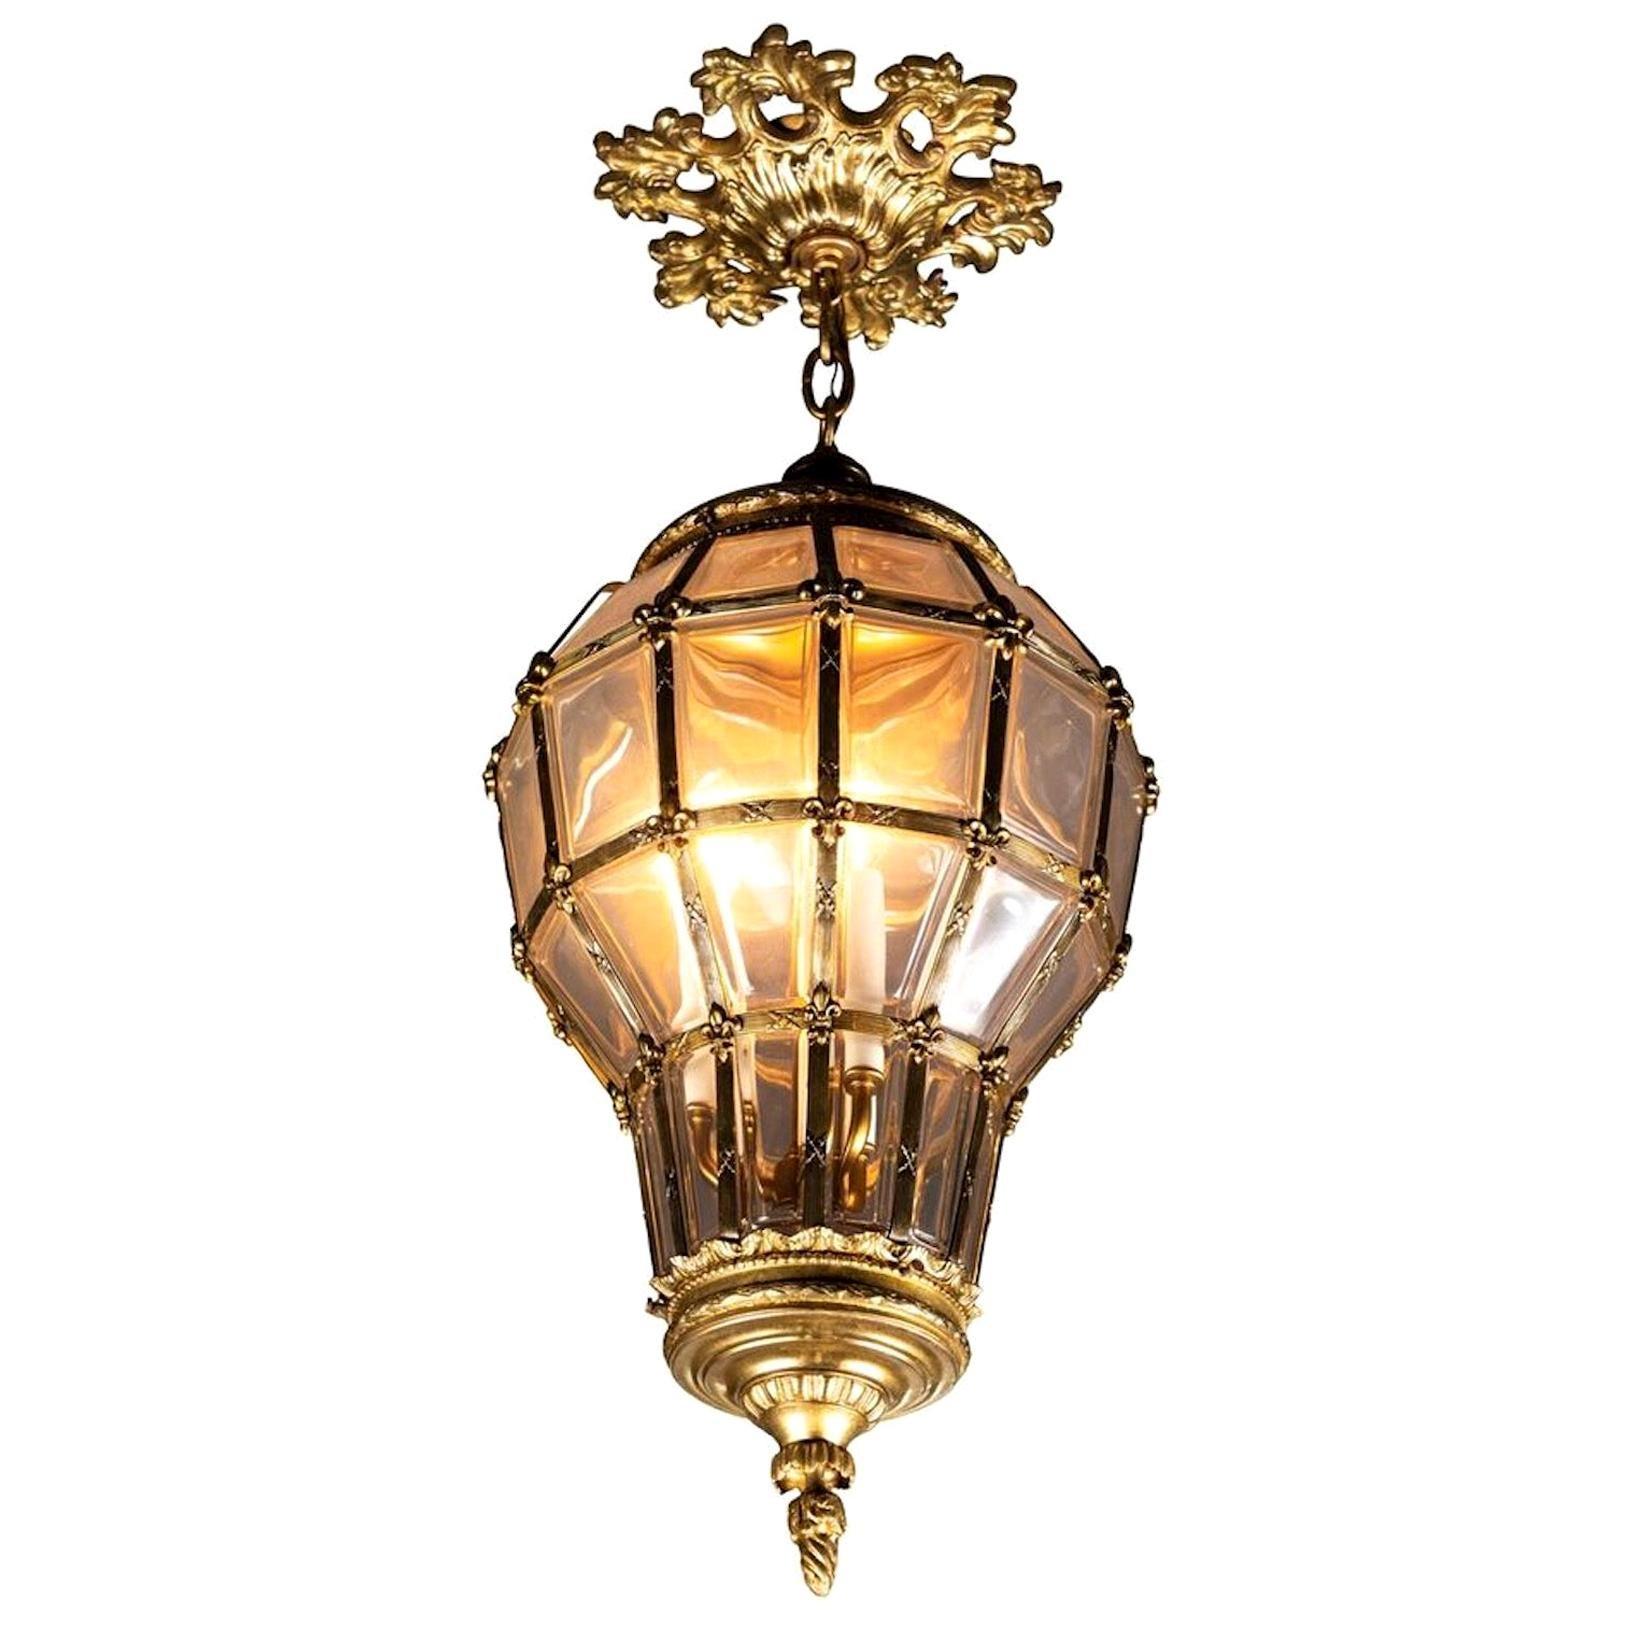 Gilt Hanging Lantern with Ceiling Escutcheon